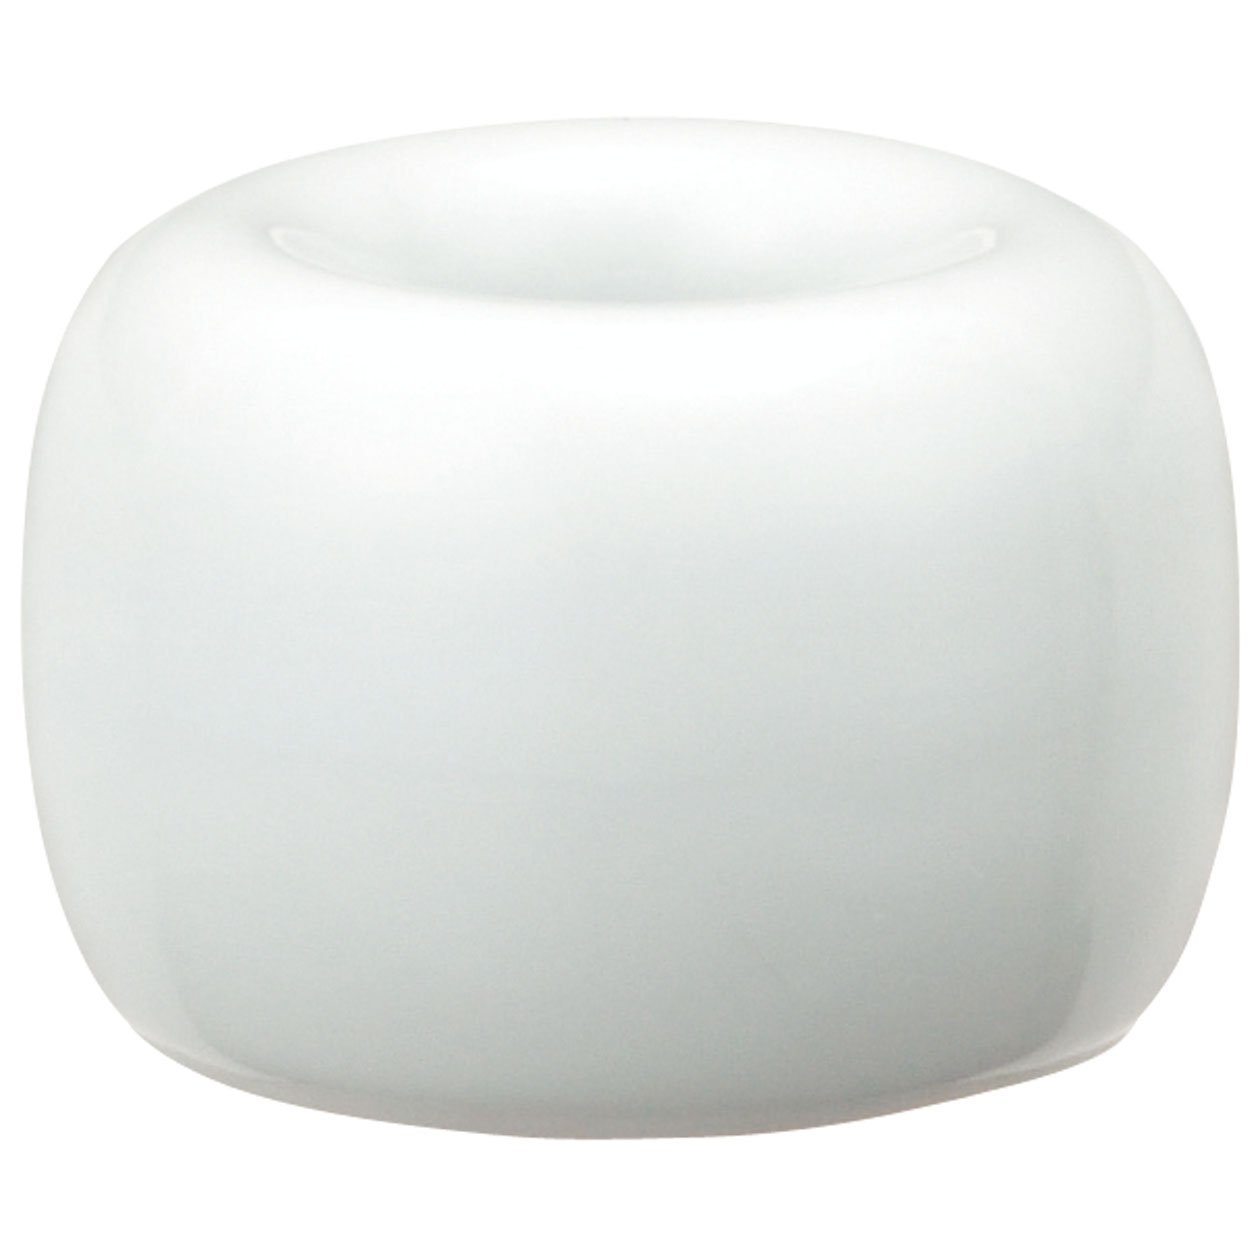 Muji White Porcelain Tooth Brush Stand - White